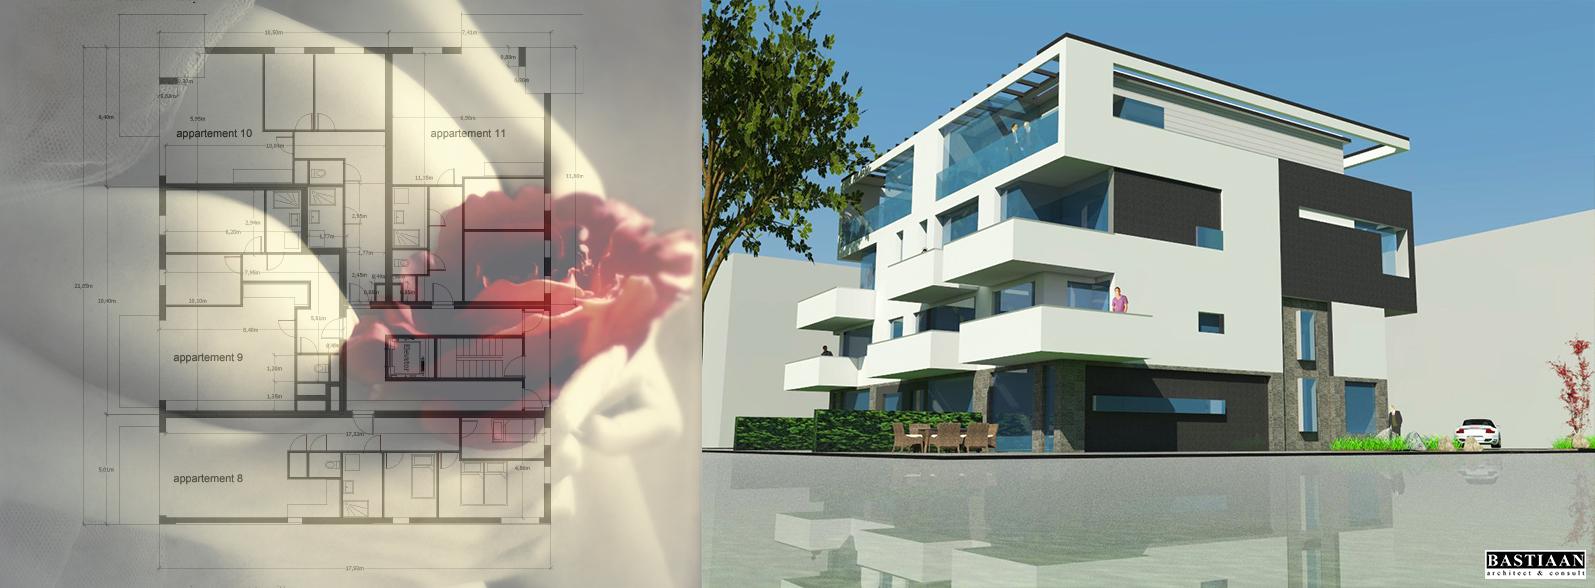 woningbouwarchitectuur | meergeneratie villa